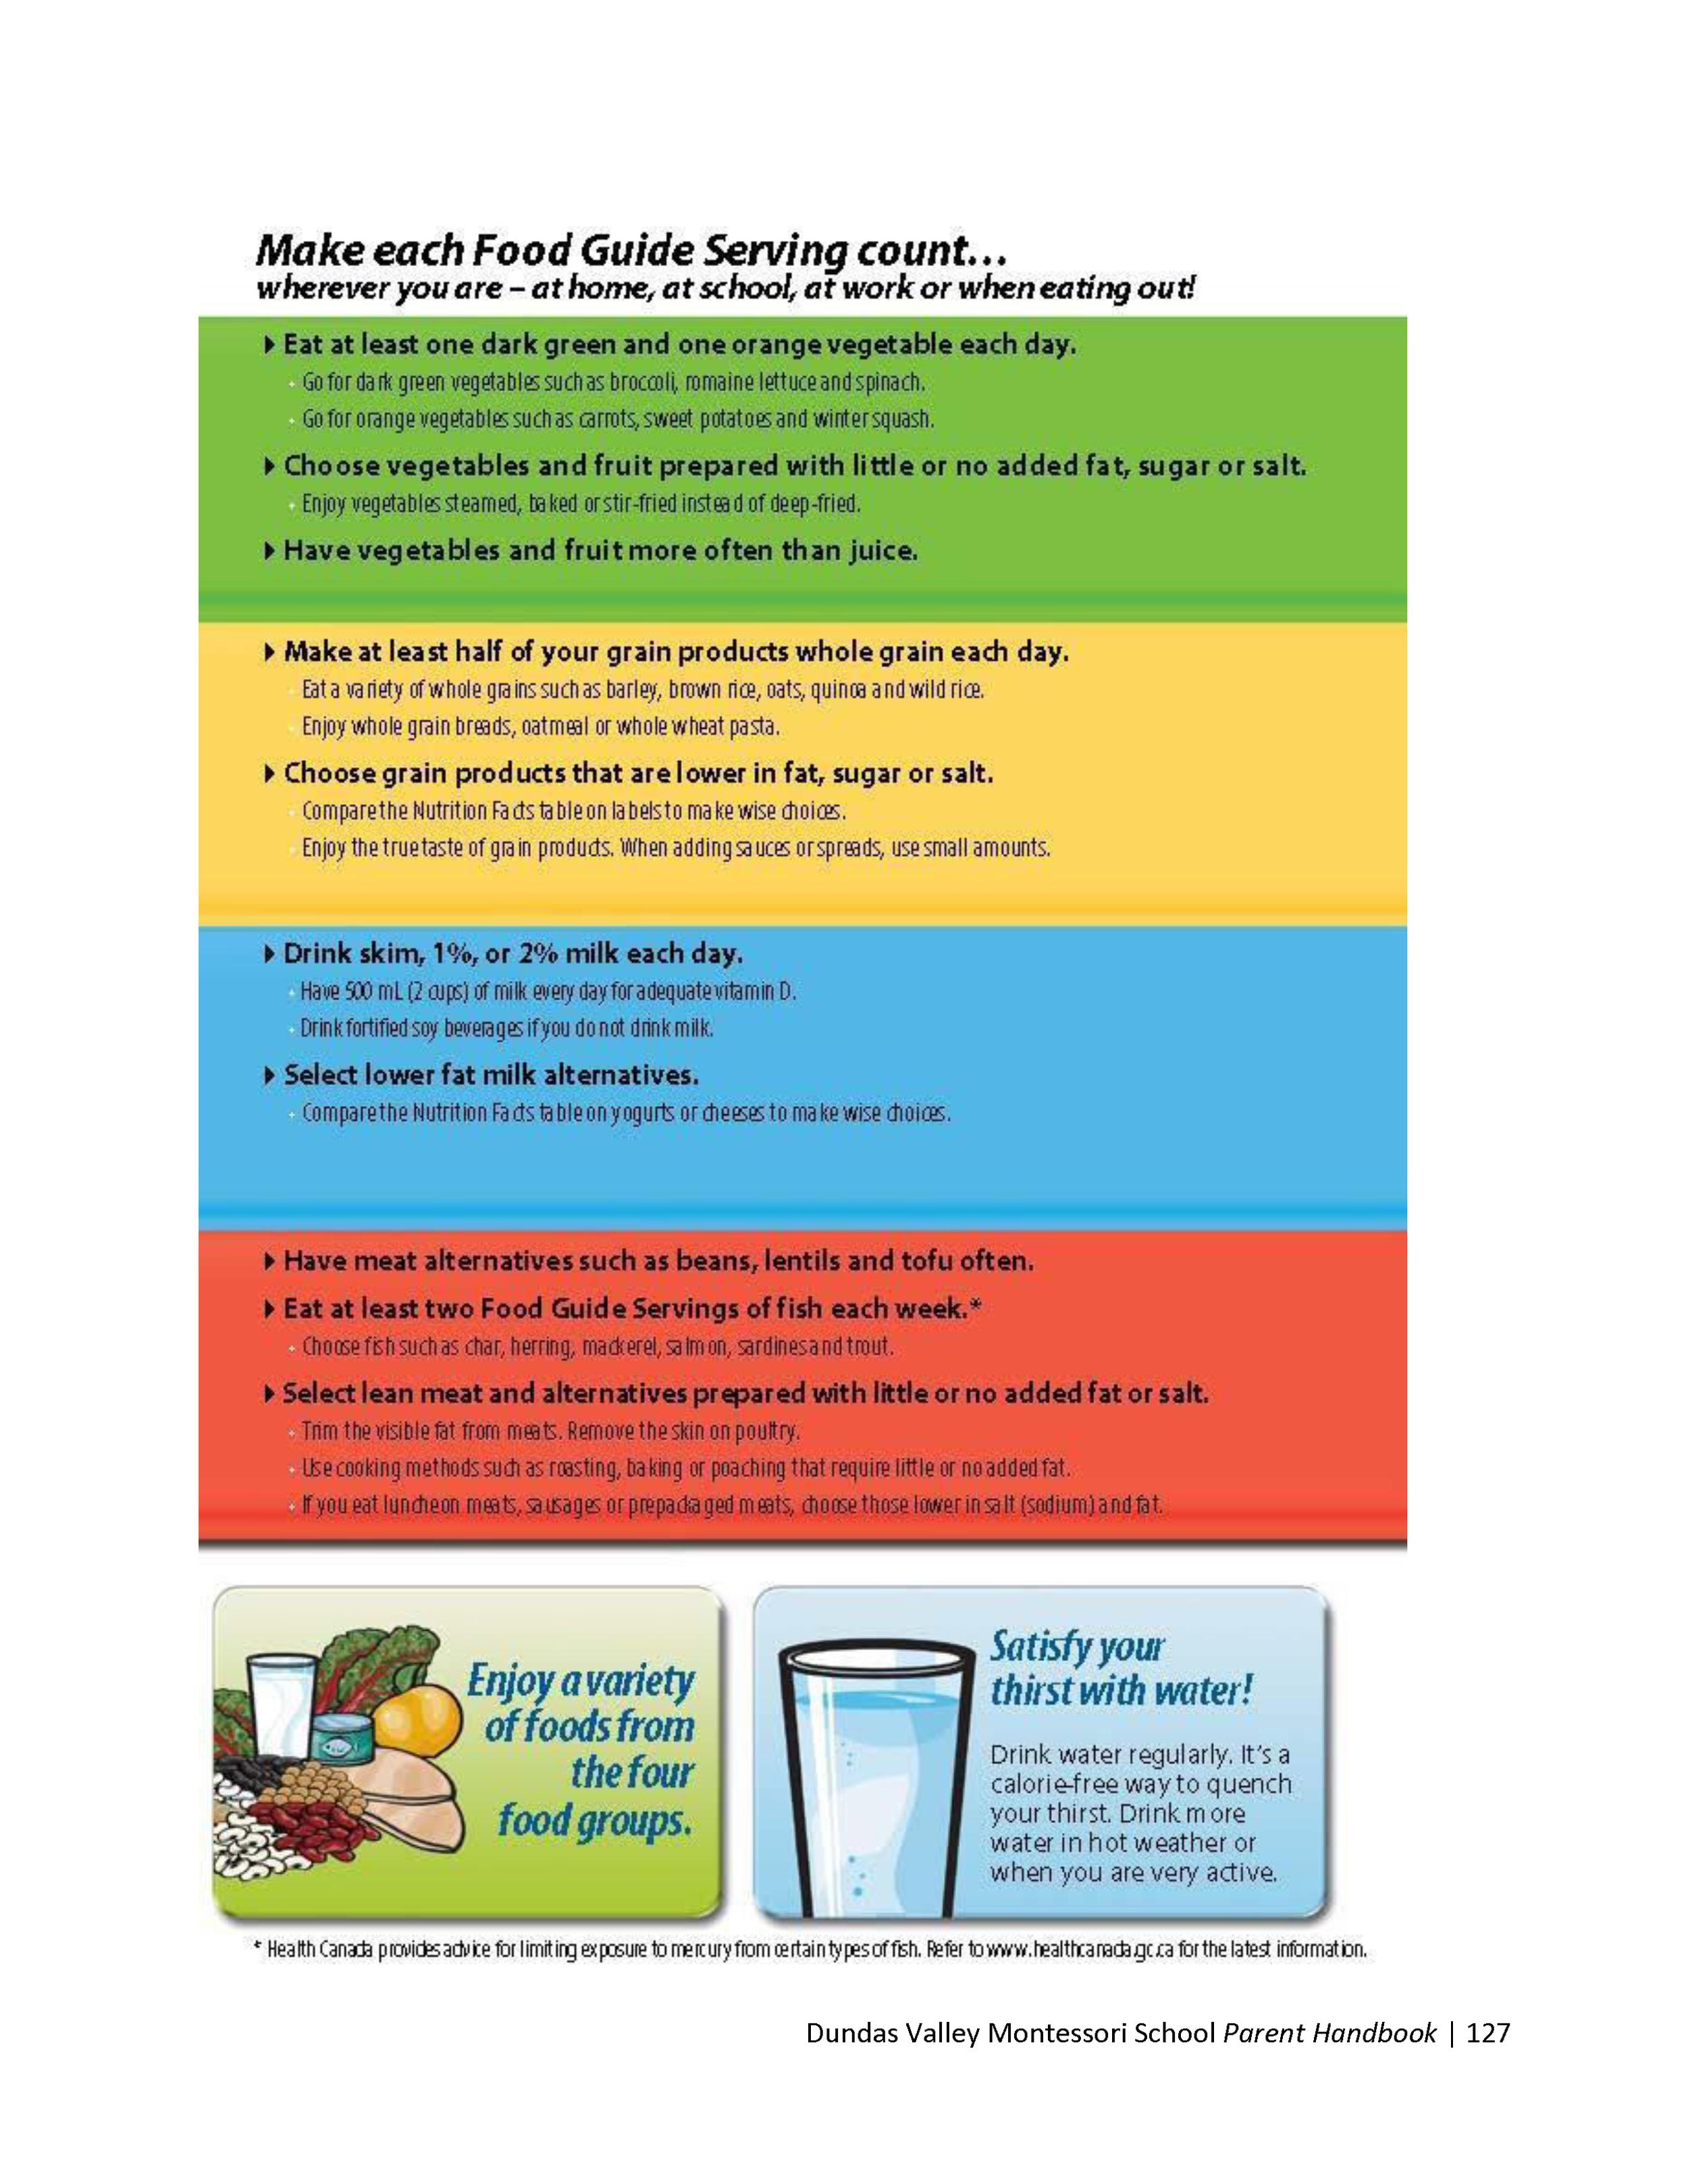 DVMS-Parent-Handbook-19-20_Page_129.png